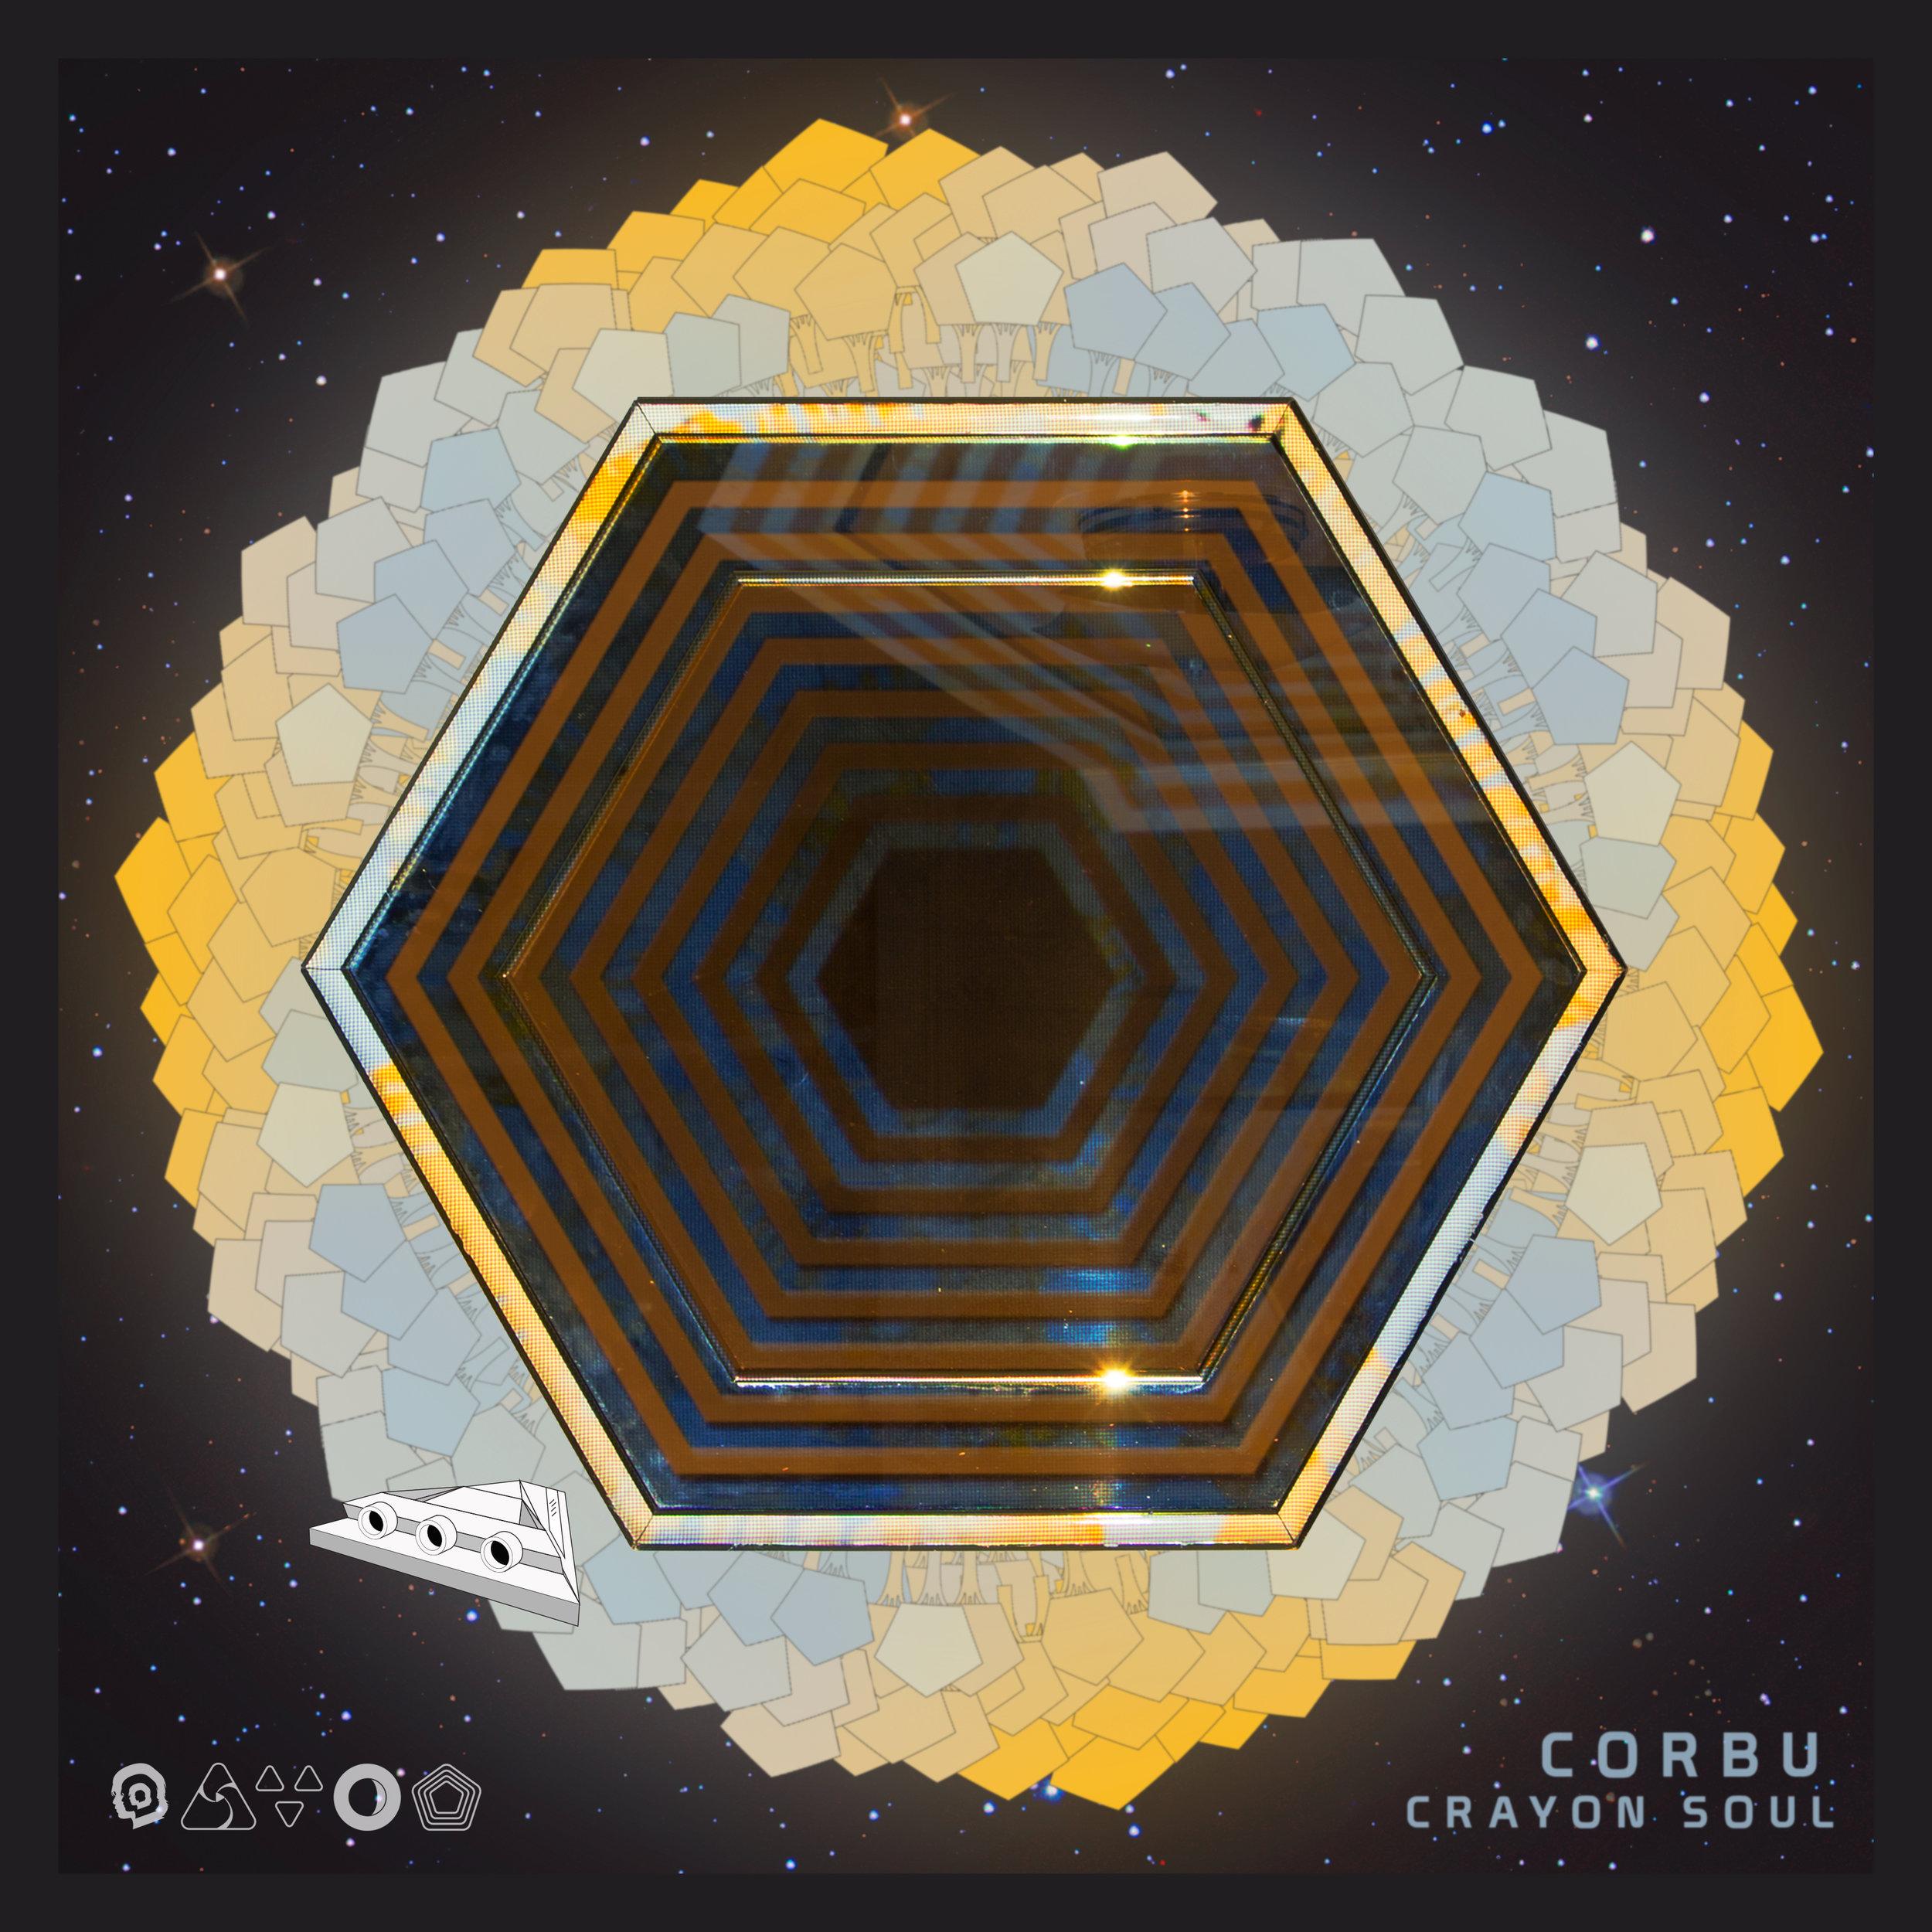 Corbu Crayon Soul - Album Cover.jpg